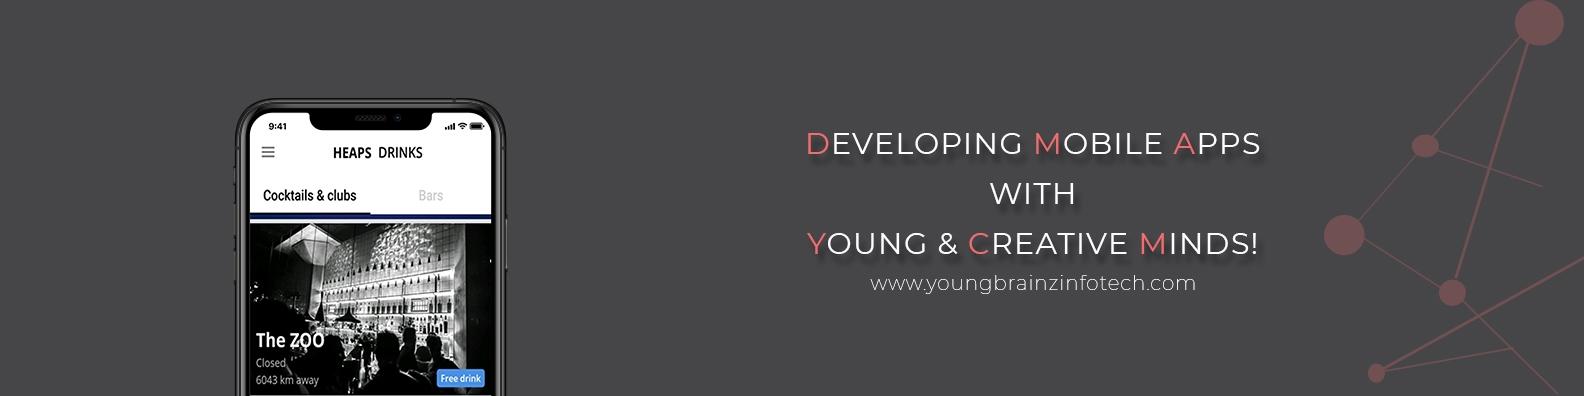 YoungBrainz Infotech (@youngbrainz) Cover Image